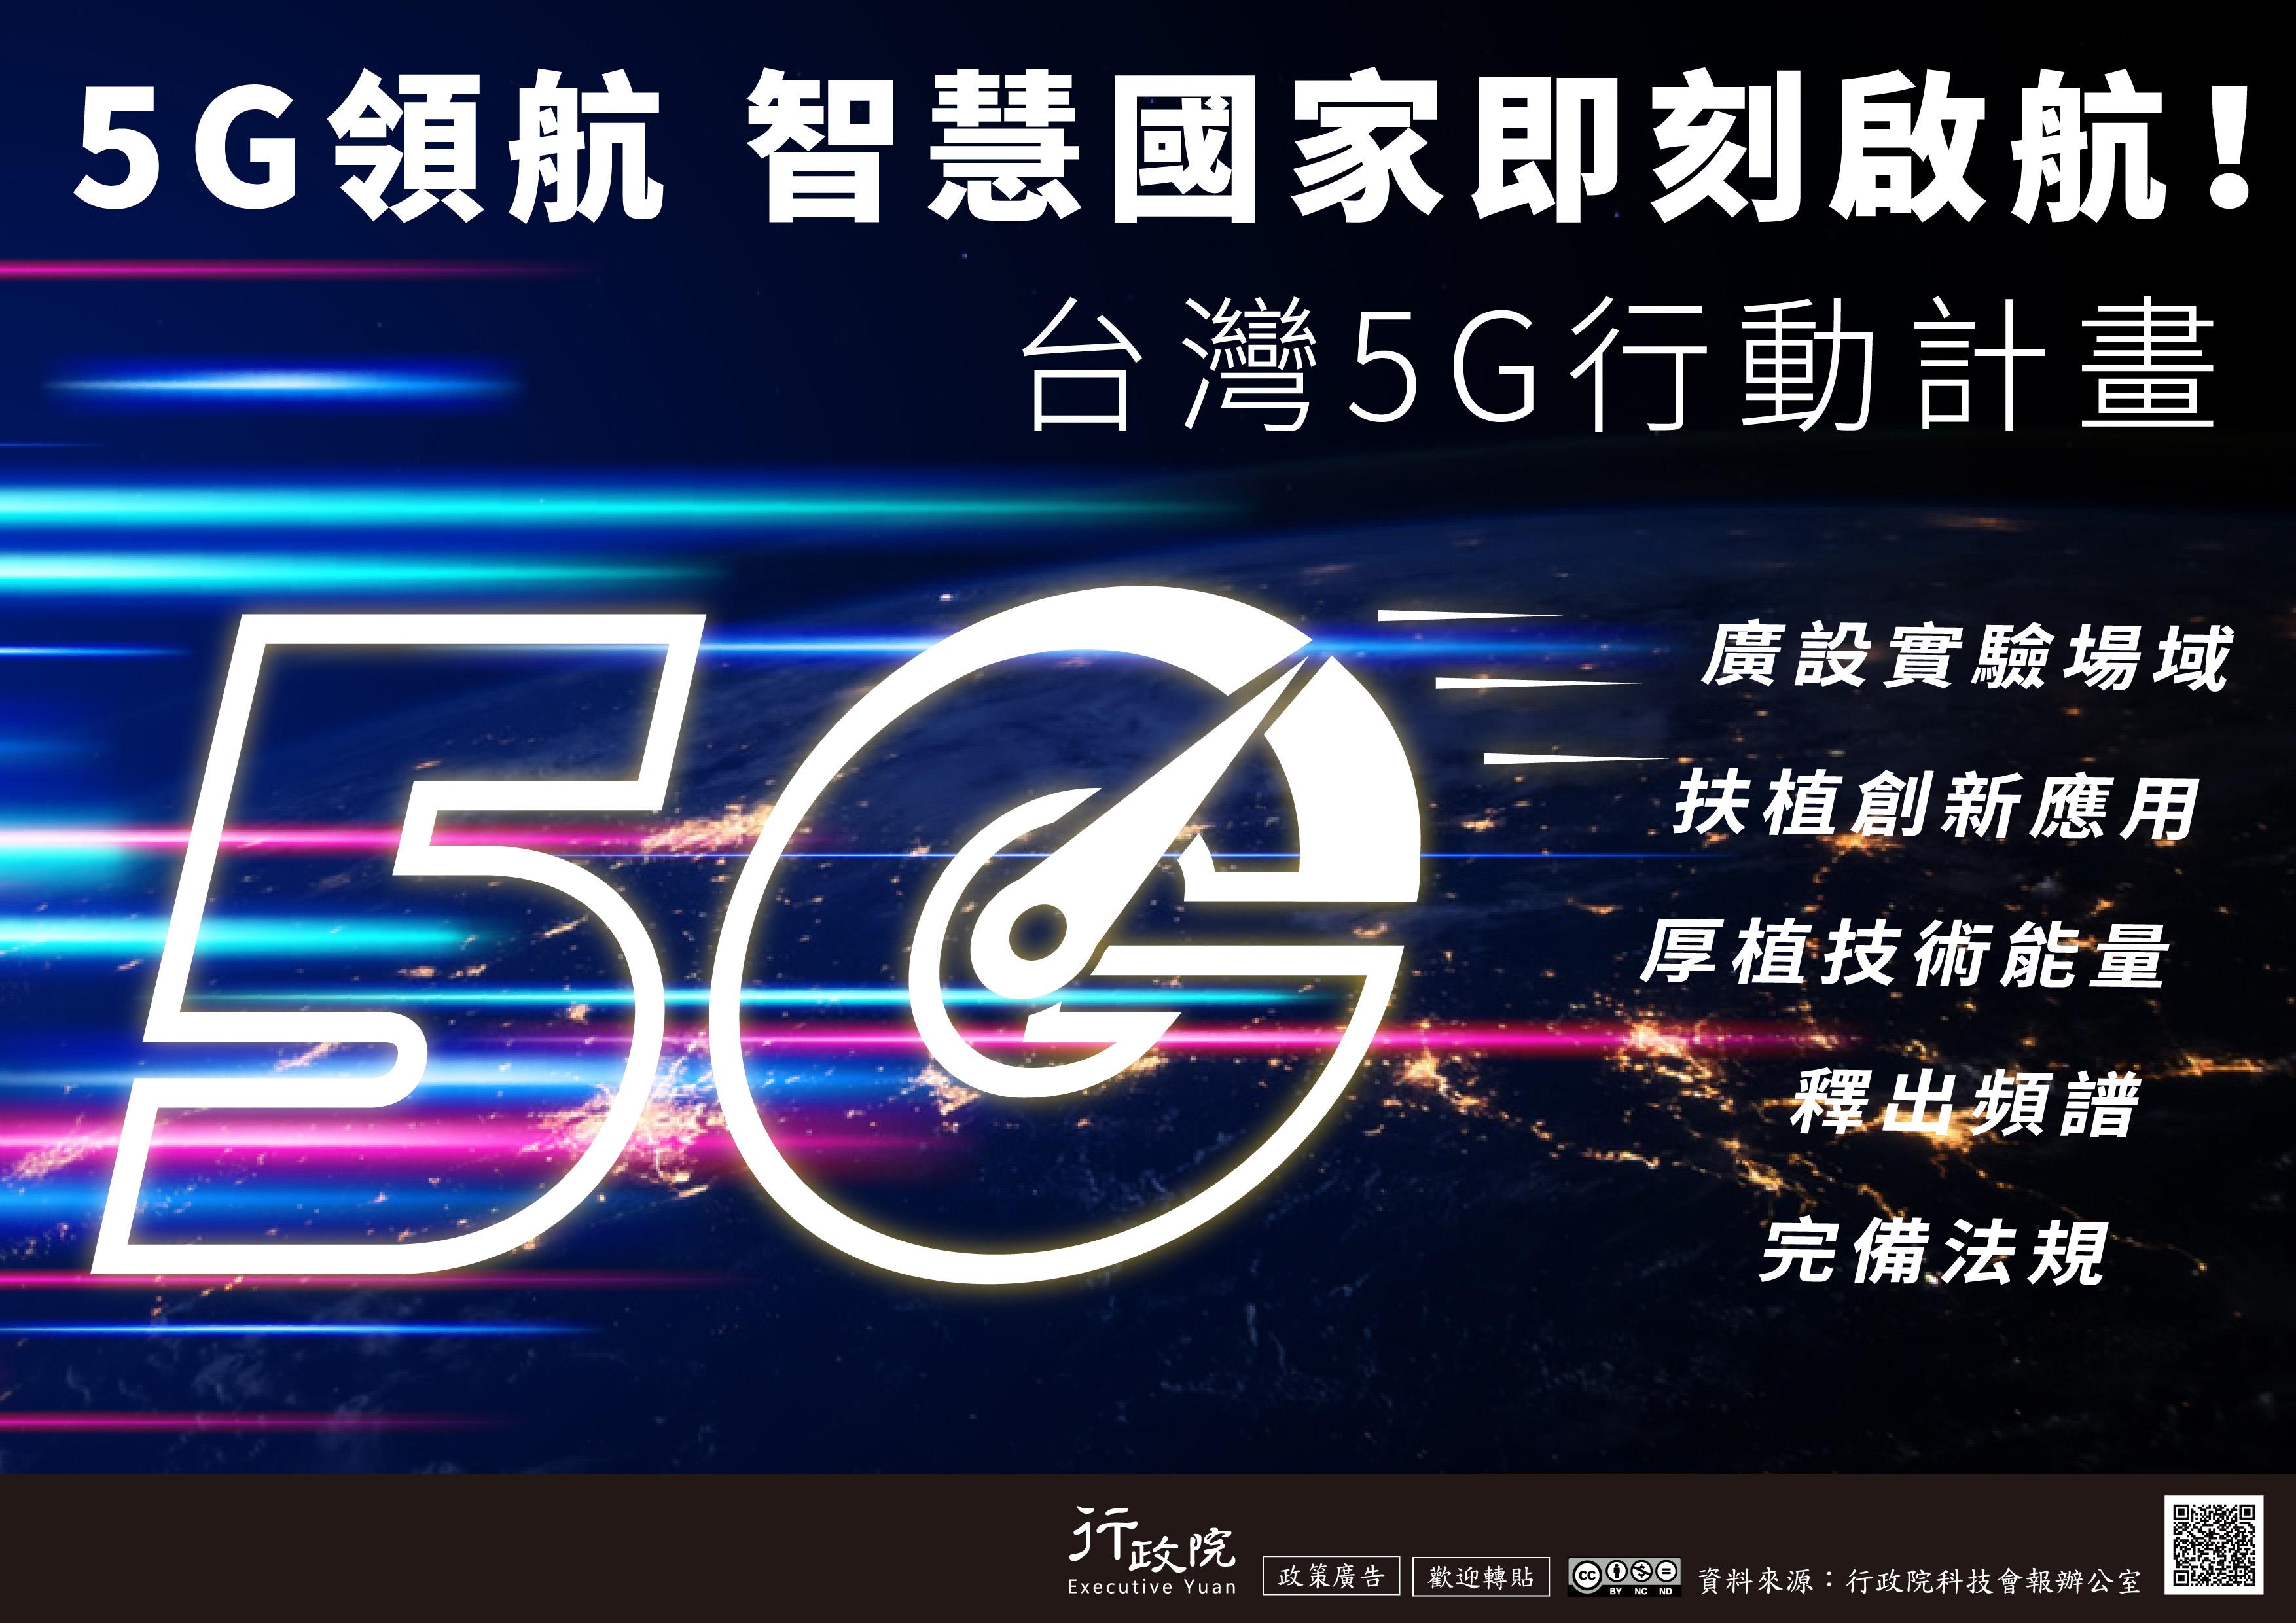 5G領航 智慧國家即刻啟航 台灣5G行動計畫